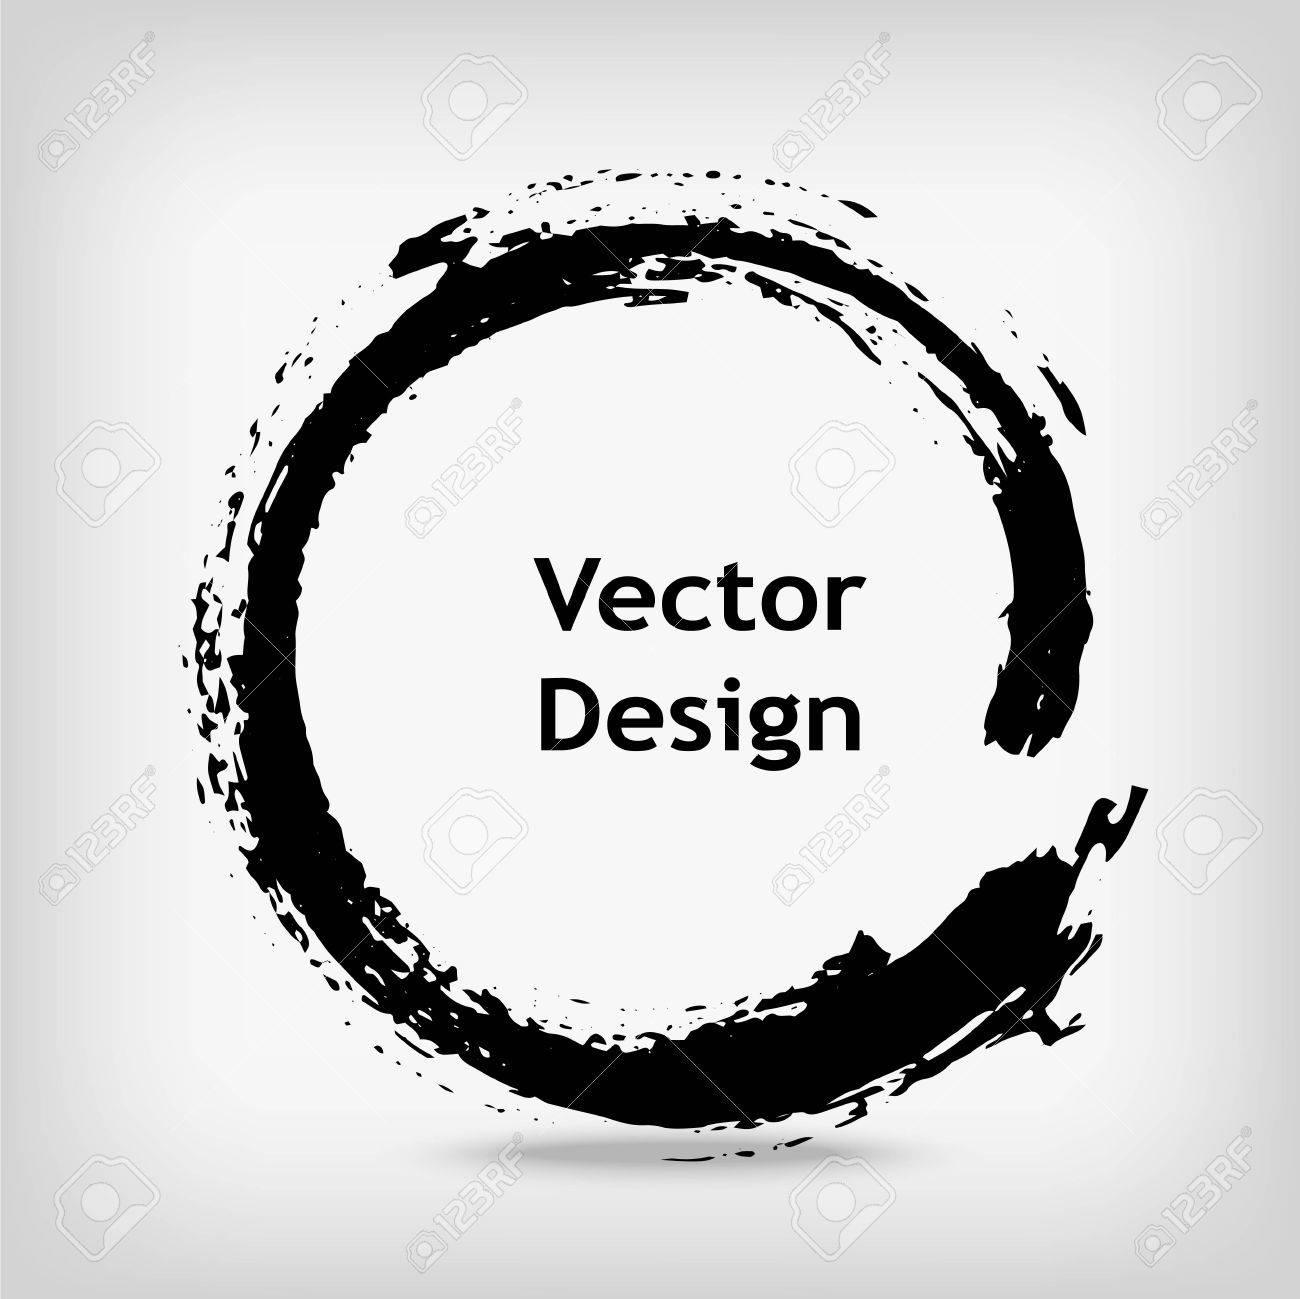 Artistic creative painted circle for logo, label, branding. Black enso zen round. Vector illustration. - 67556623